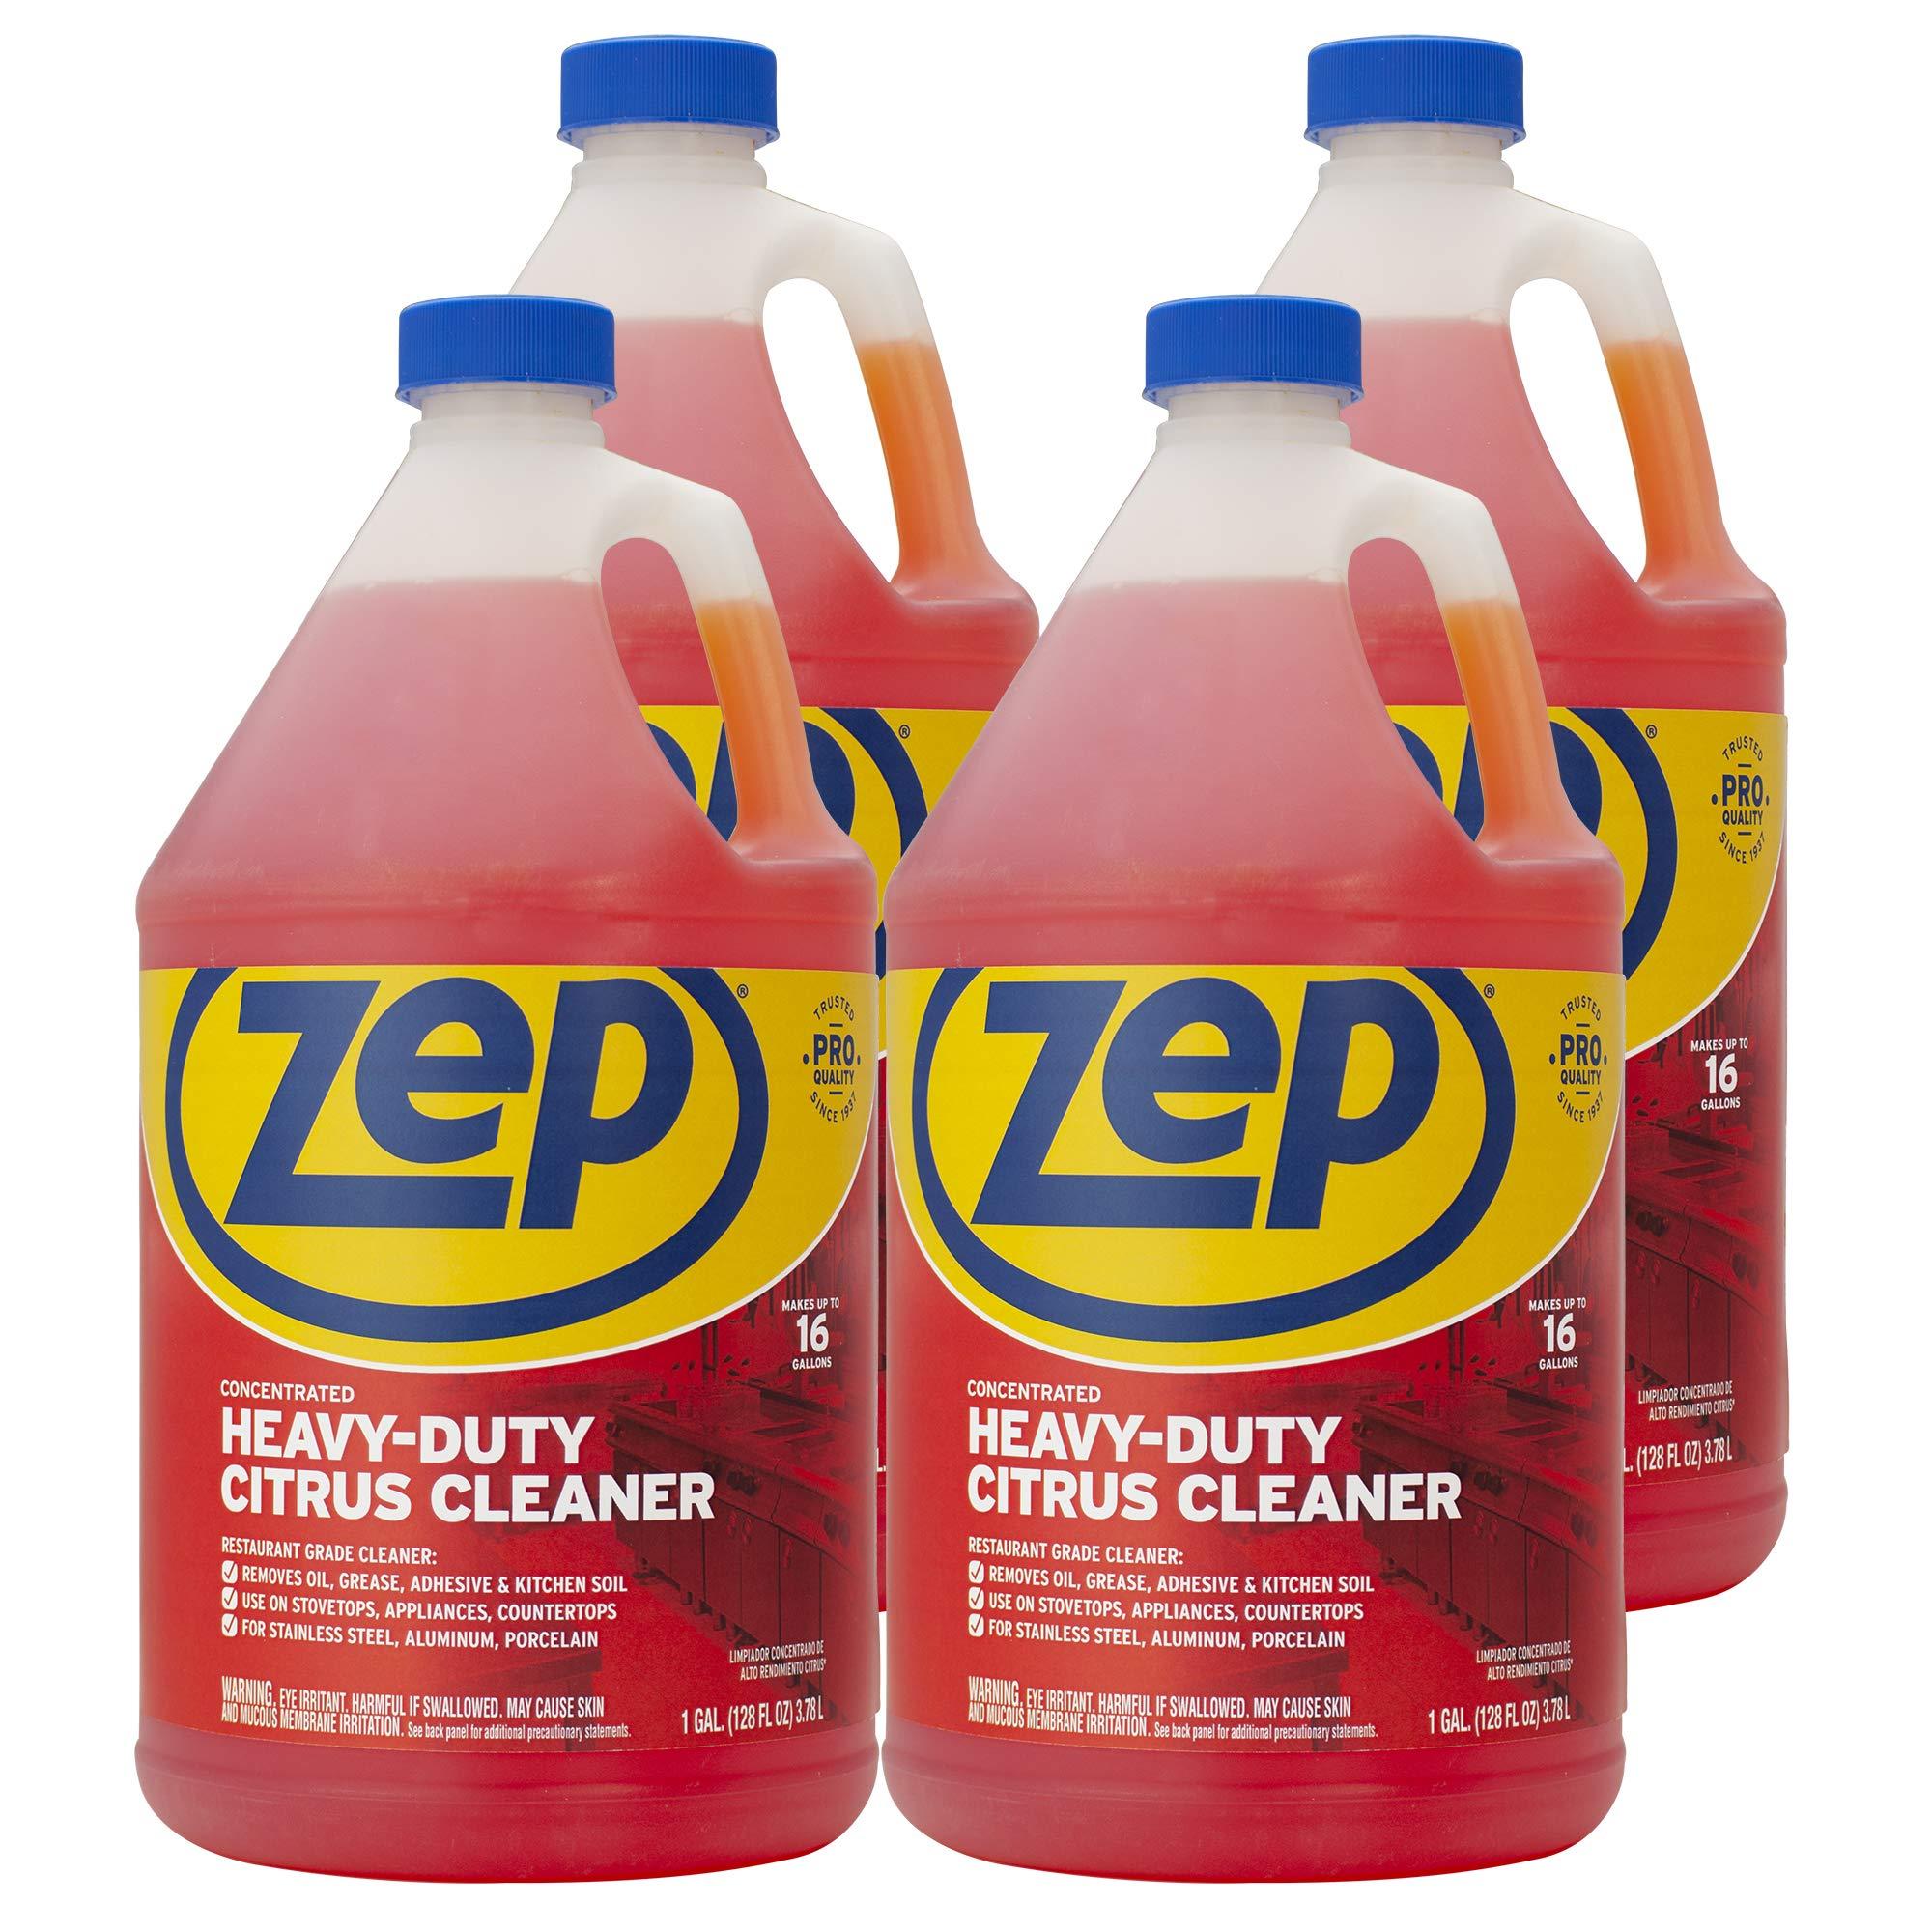 Zep Heavy-Duty Citrus Cleaner 128 Ounce ZUCIT128CA (Case of 4)